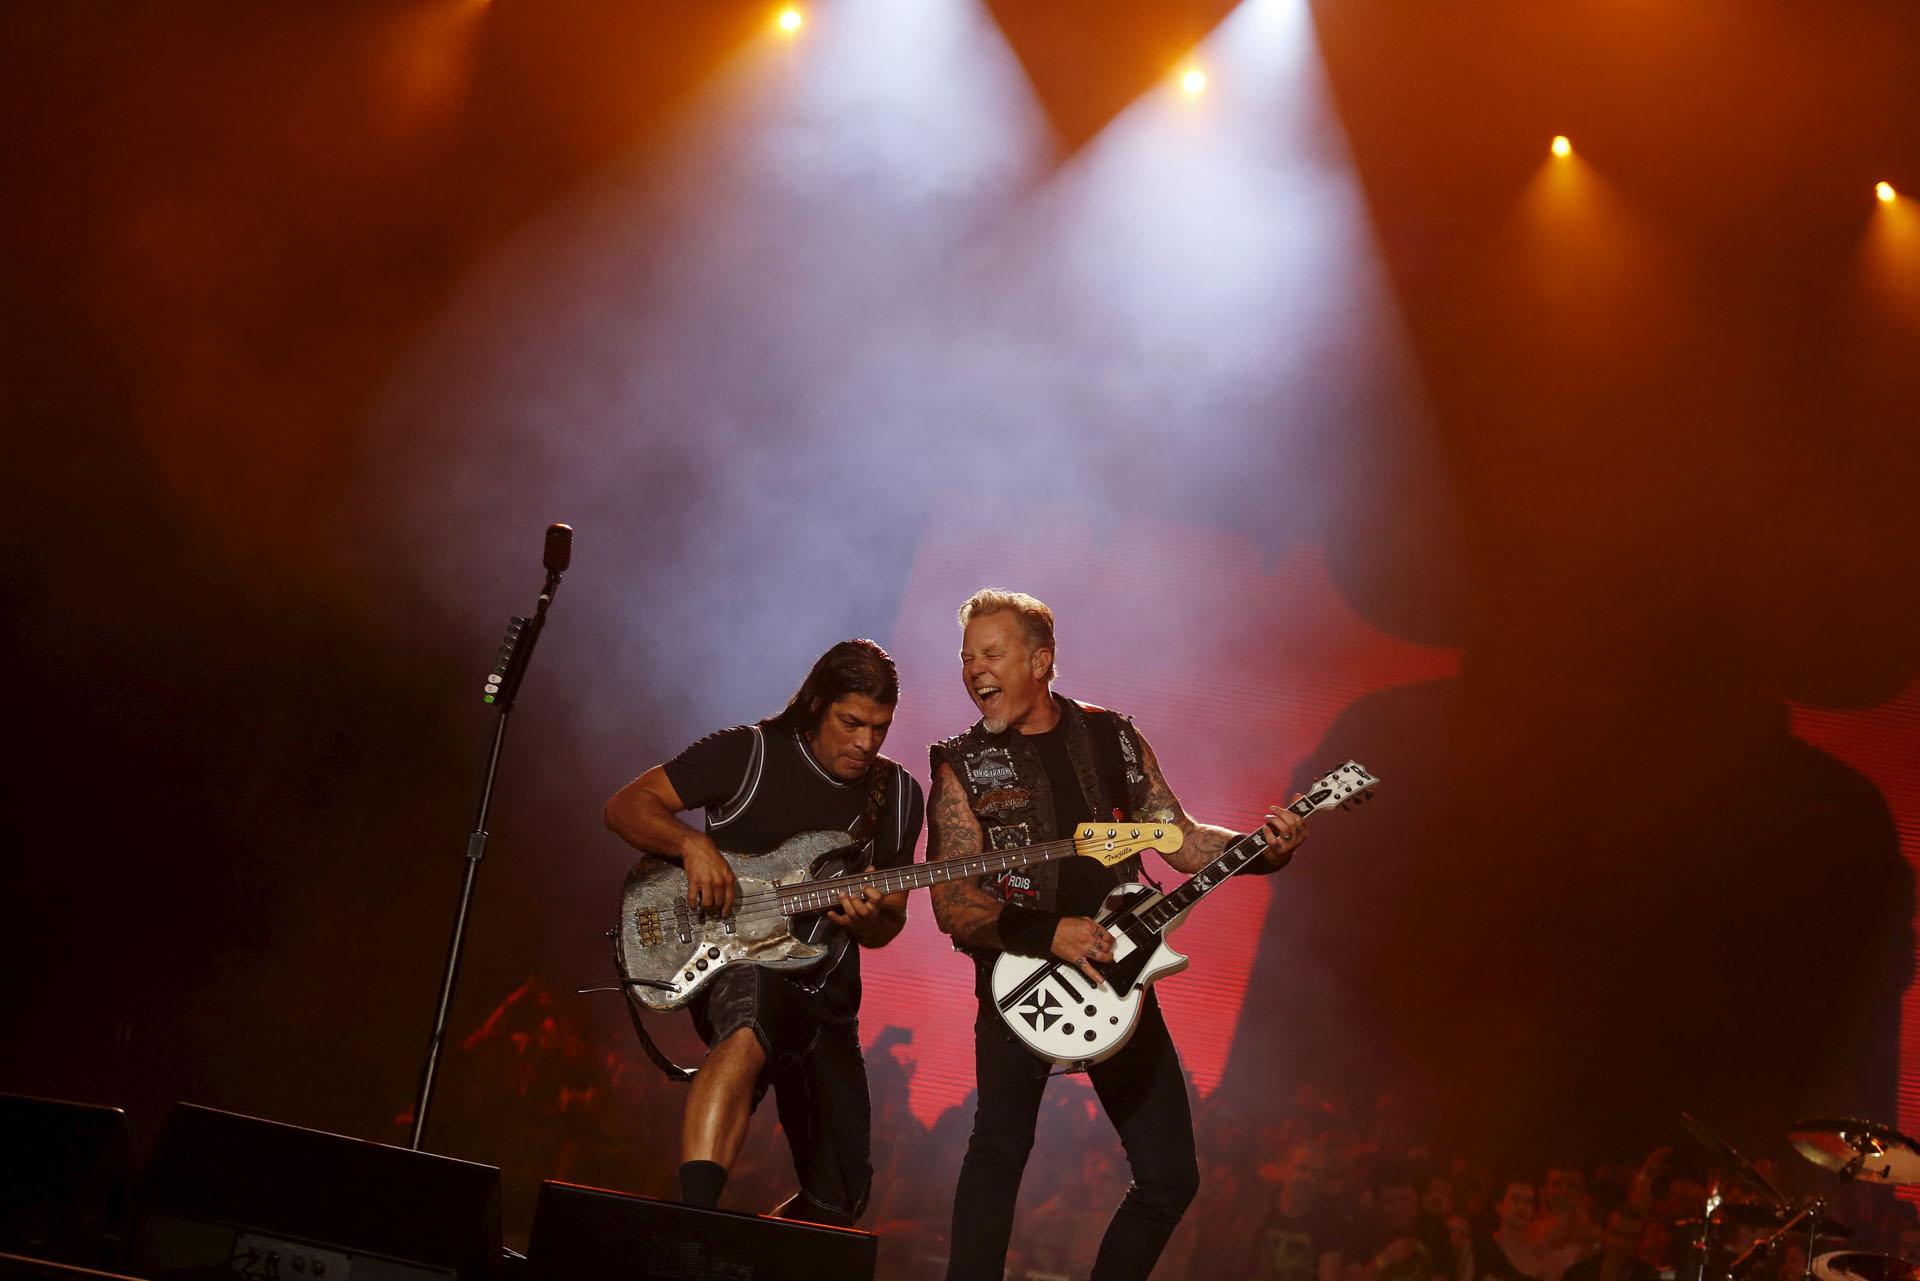 James Hetfield (R) and Robert Trujillo of Metallica perform during the Rock in Rio Music Festival in Rio de Janeiro, Brazil, September 20, 2015. REUTERS/Pilar Olivares